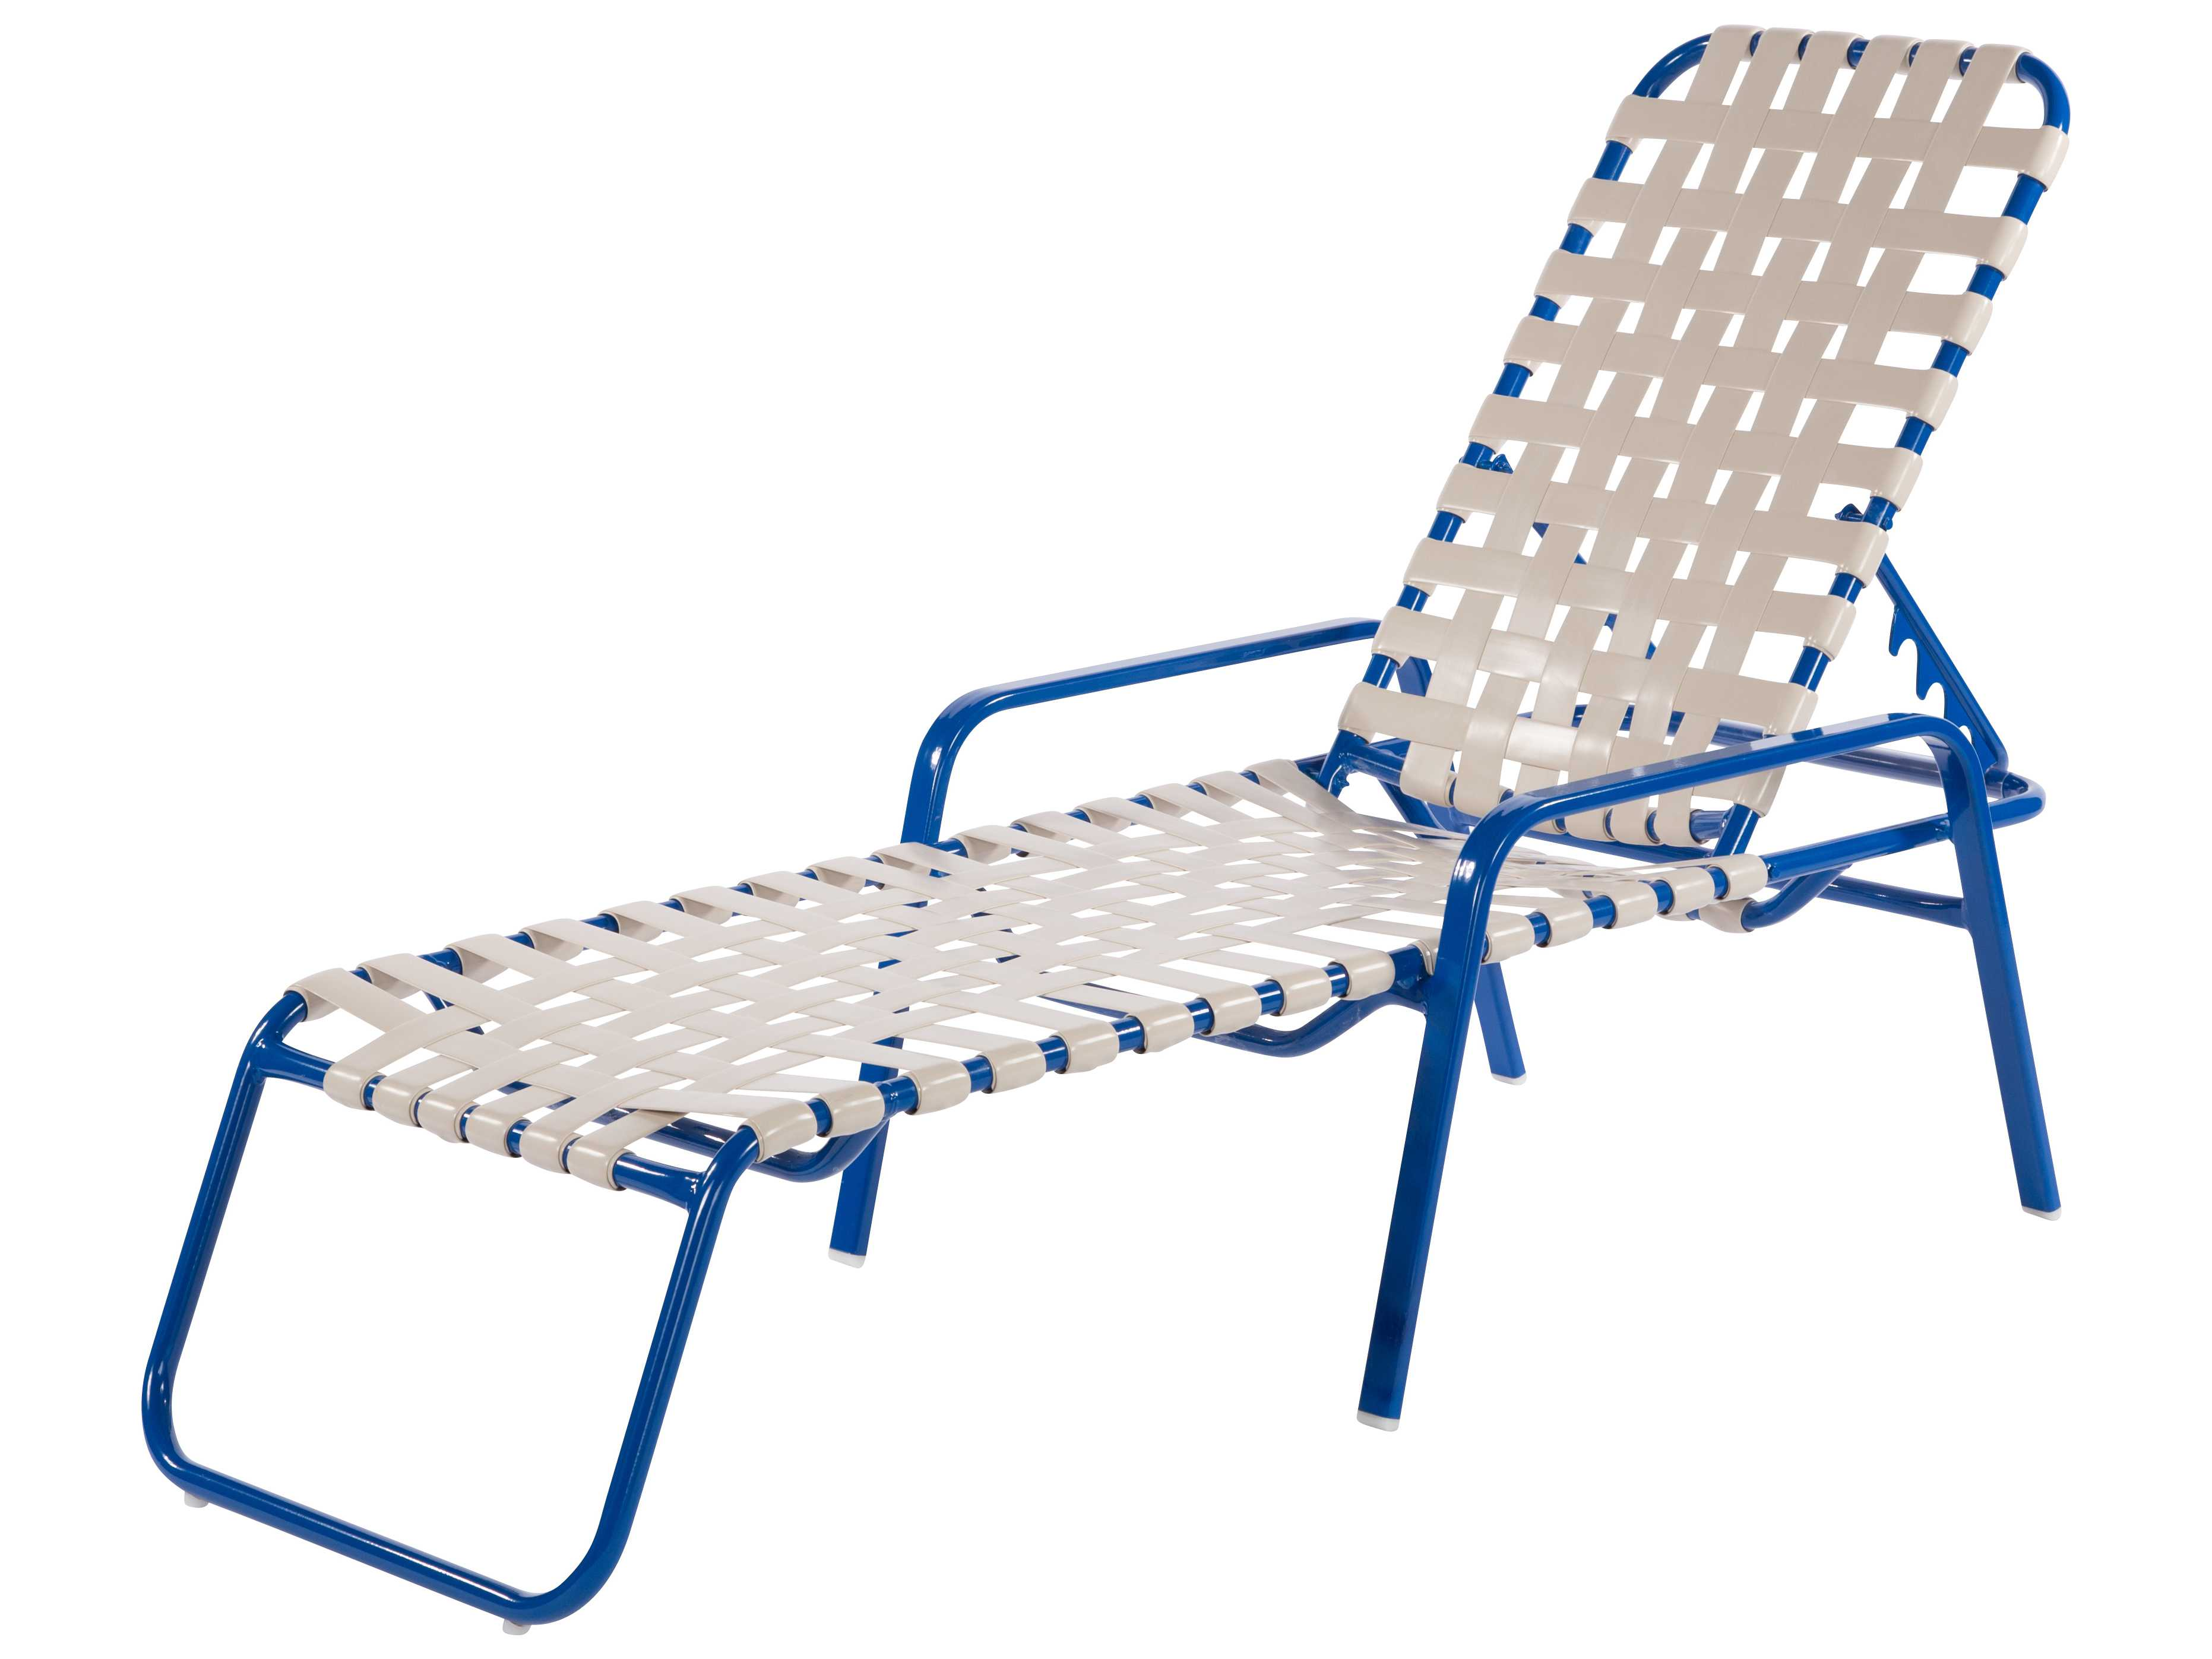 Windward design group regatta strap aluminum chaise lounge for Aluminum strap chaise lounge